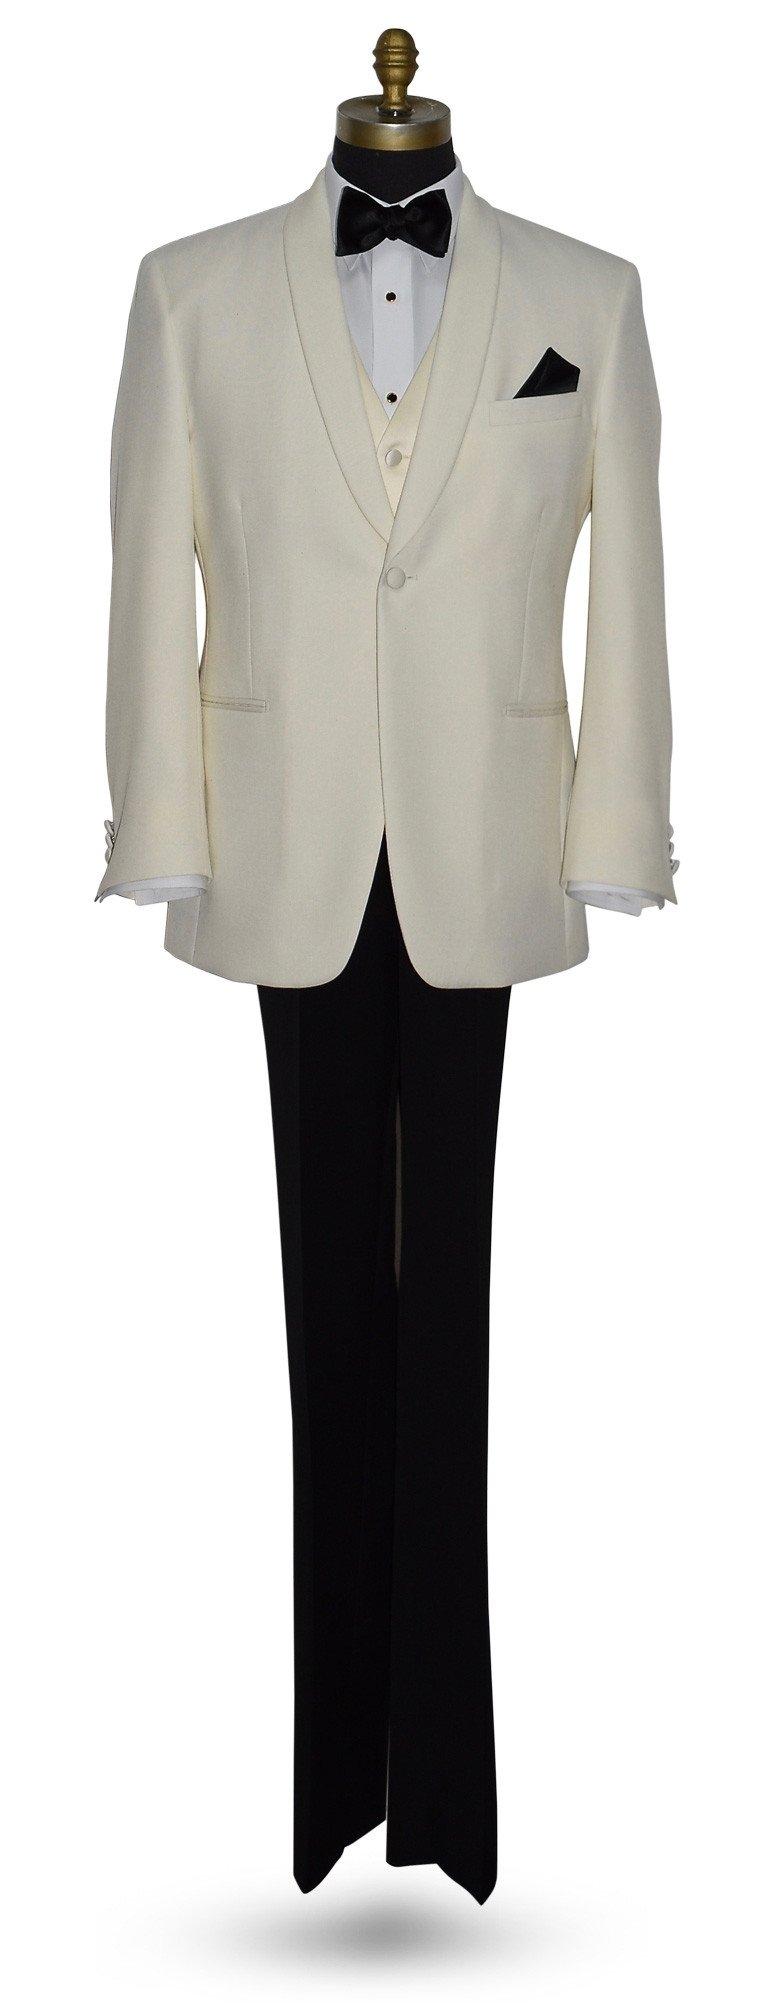 Ivory Shawl Collar Tuxedo Ensemble